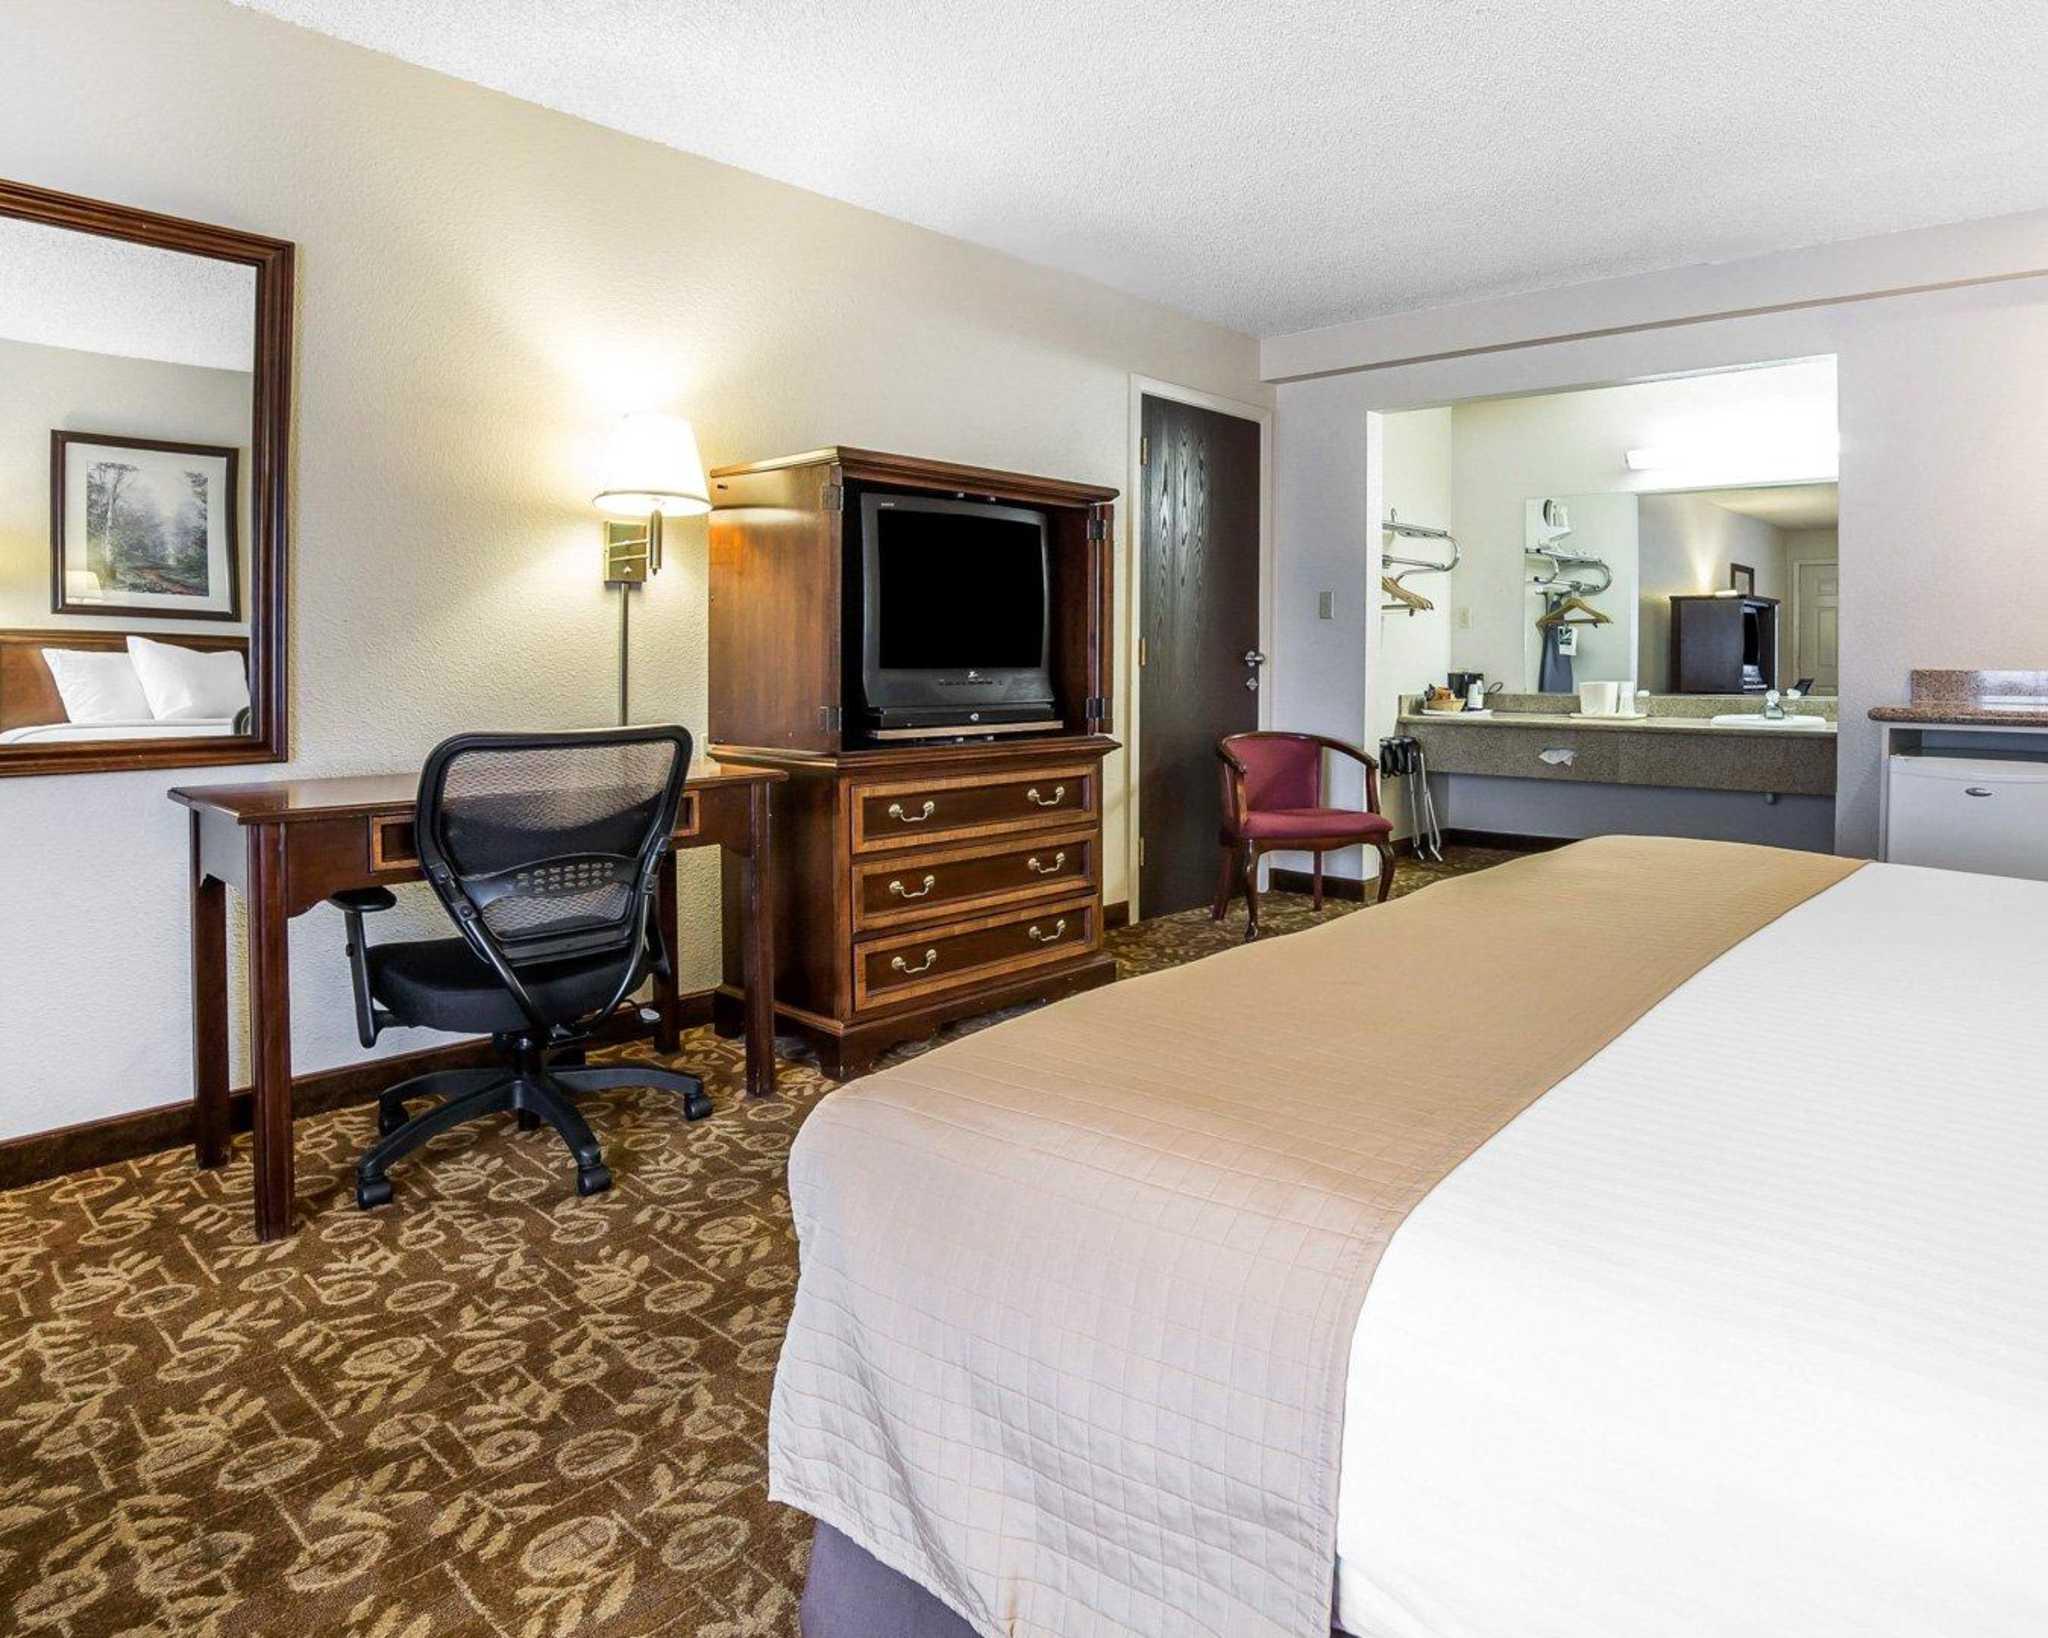 Quality Inn & Suites Minden US-395 image 26